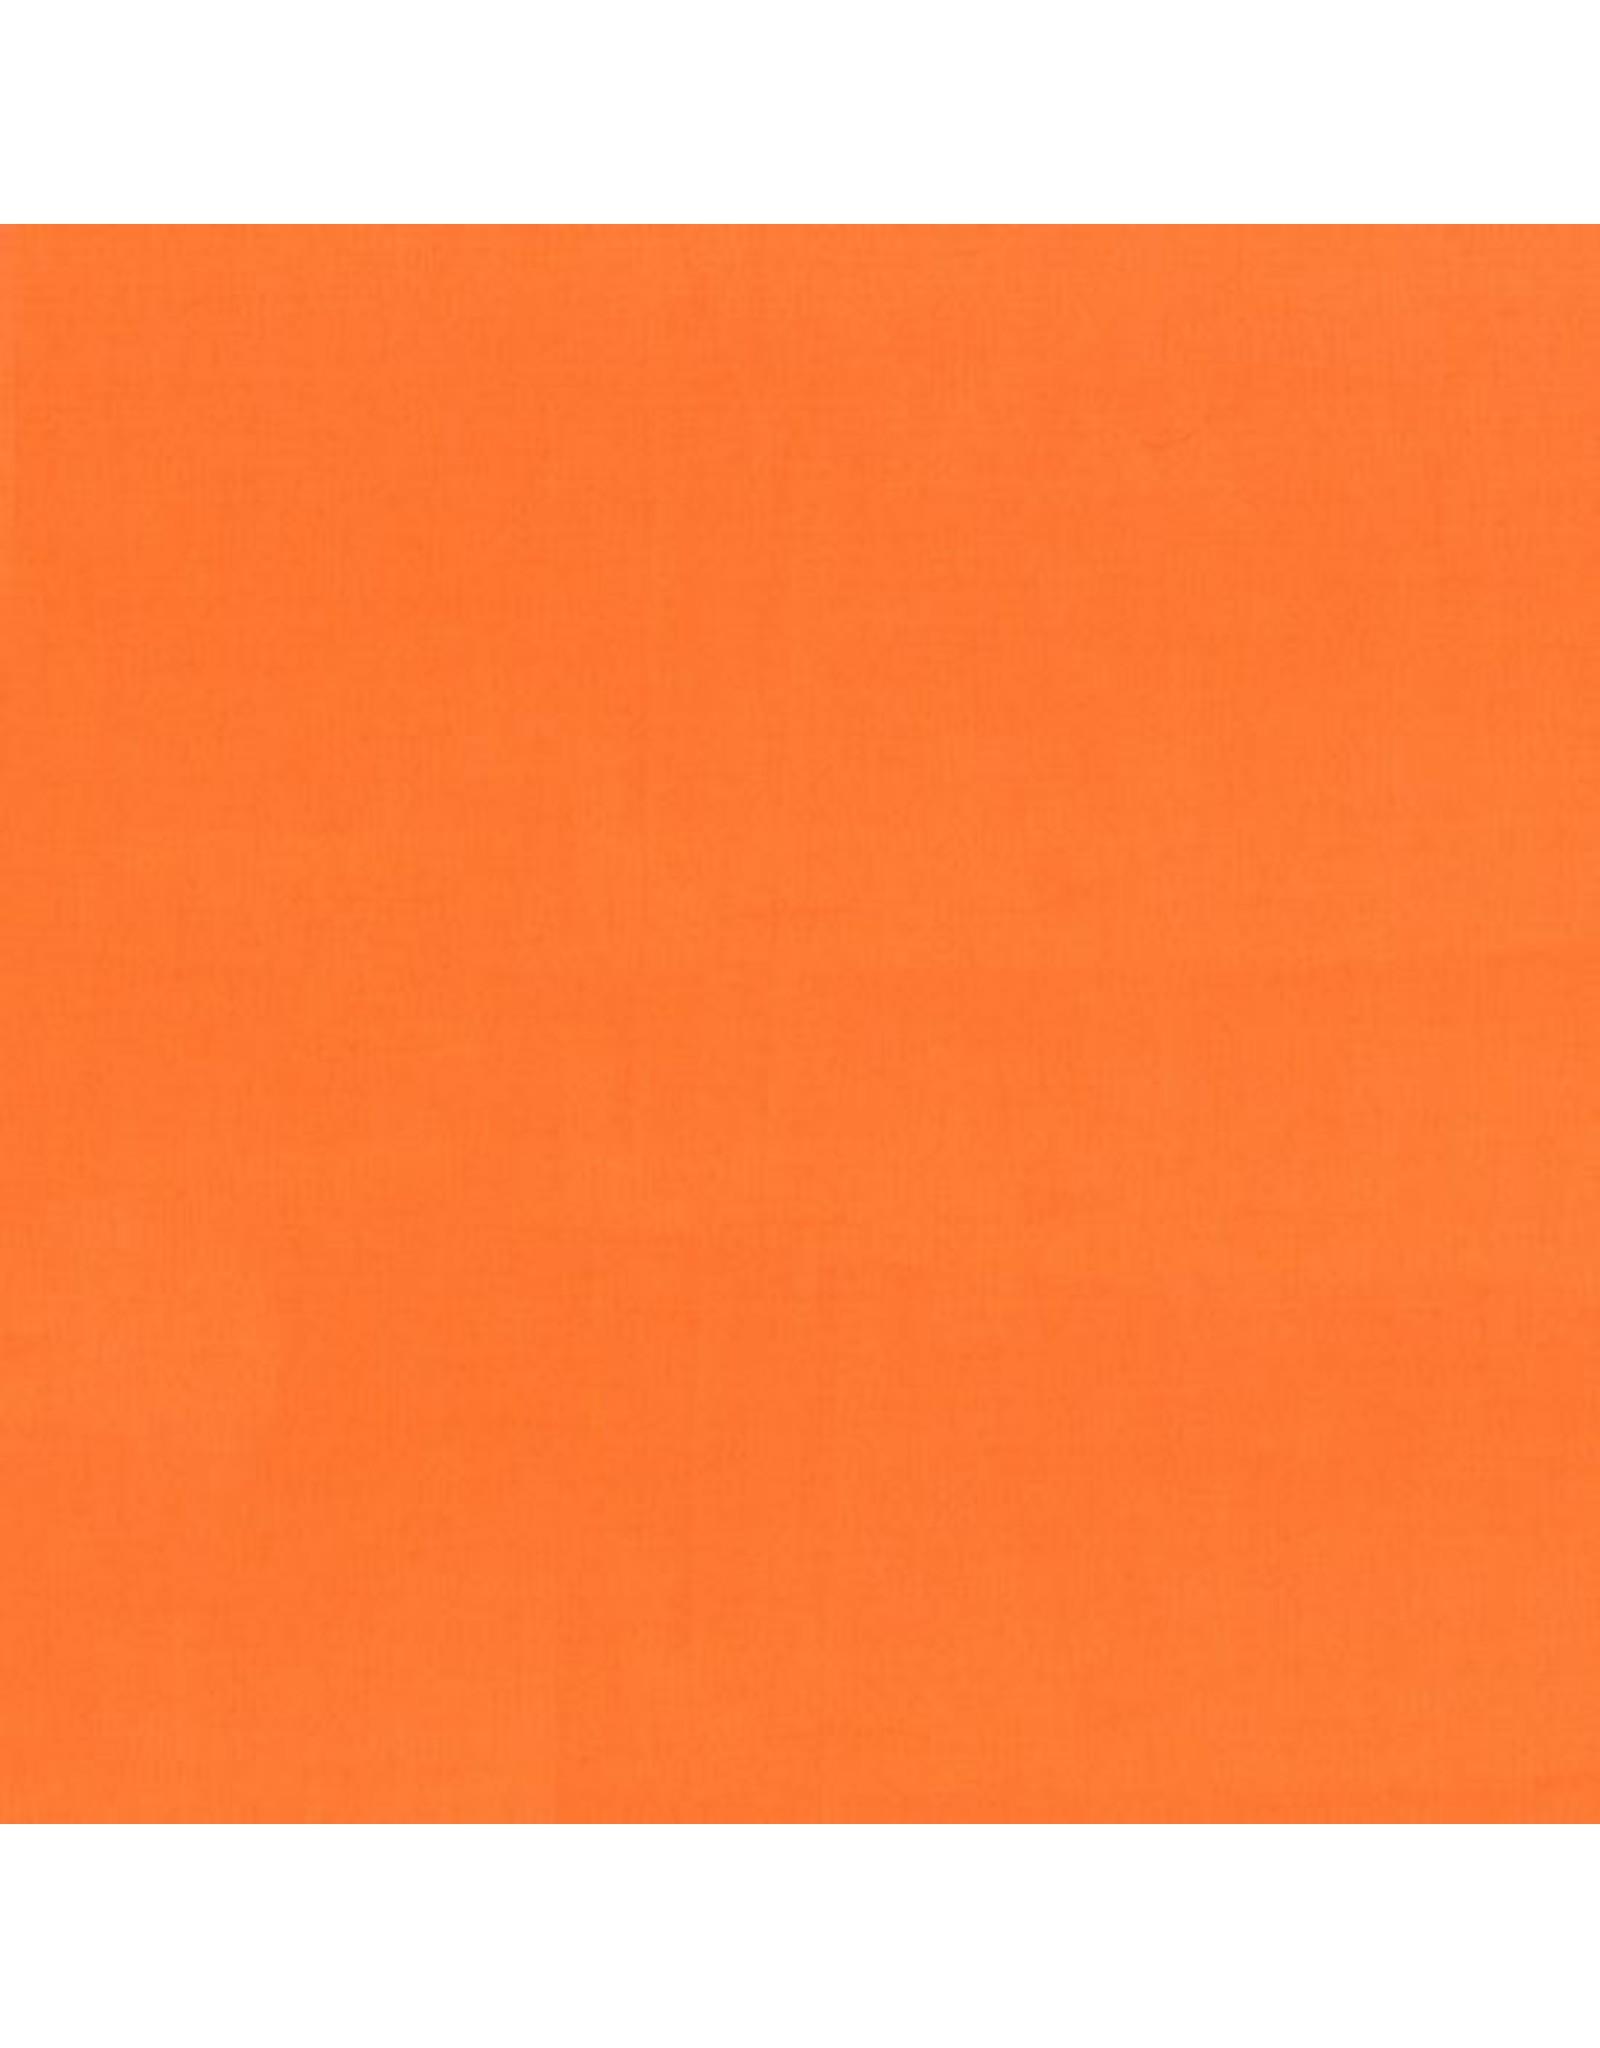 Me+You by Hoffman Fabrics Indah Solids - Cadmium Orange coupon (± 39 x 110 cm)